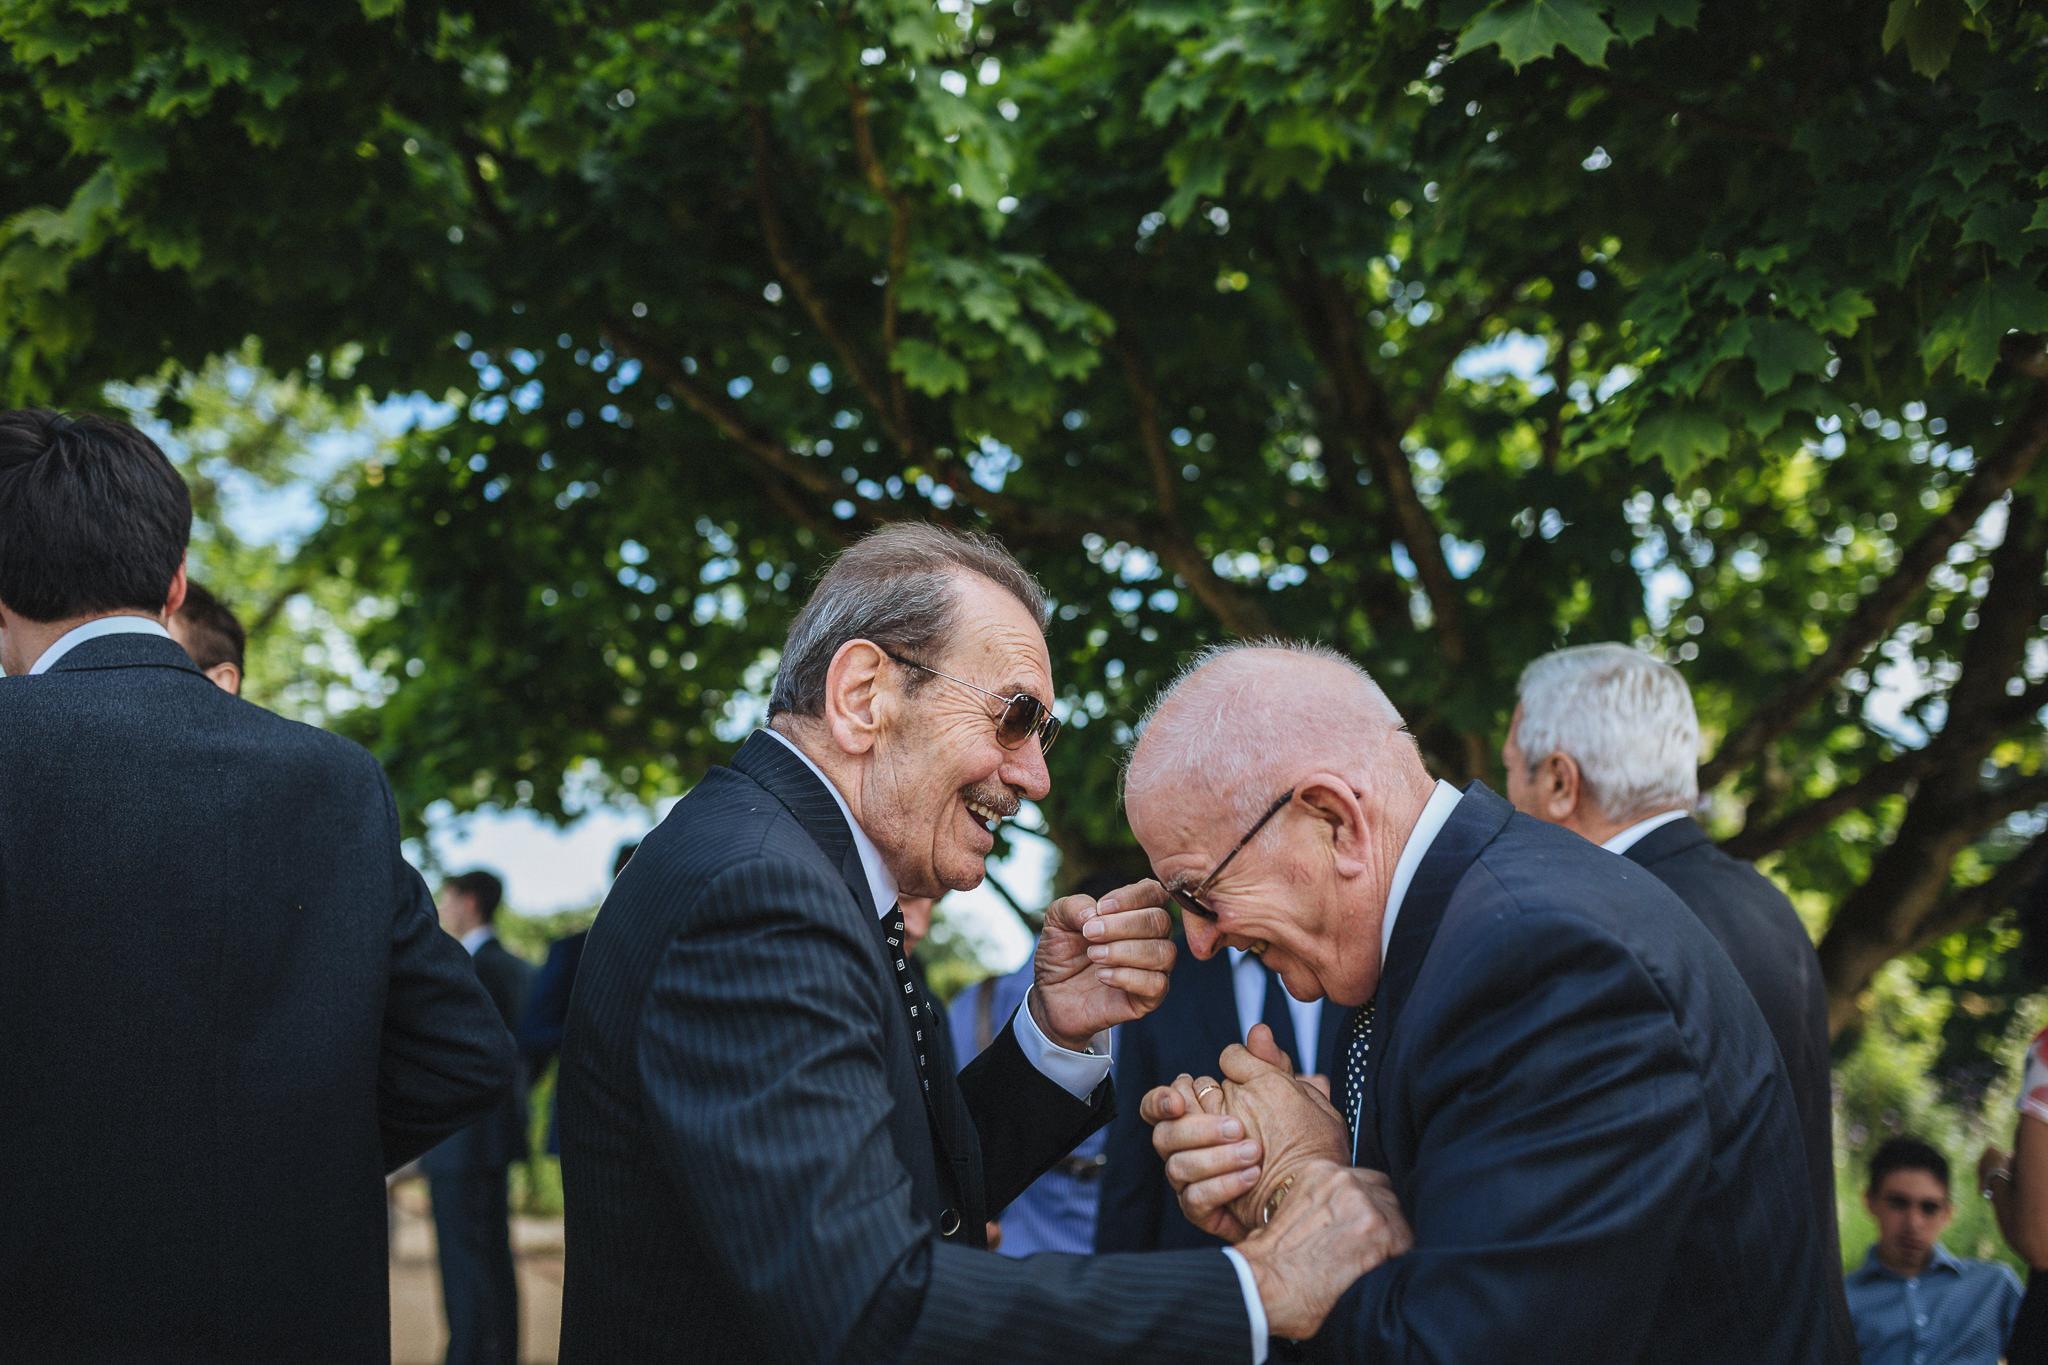 paul-marbrook-Gaynes-Park Wedding-Photographer-90090